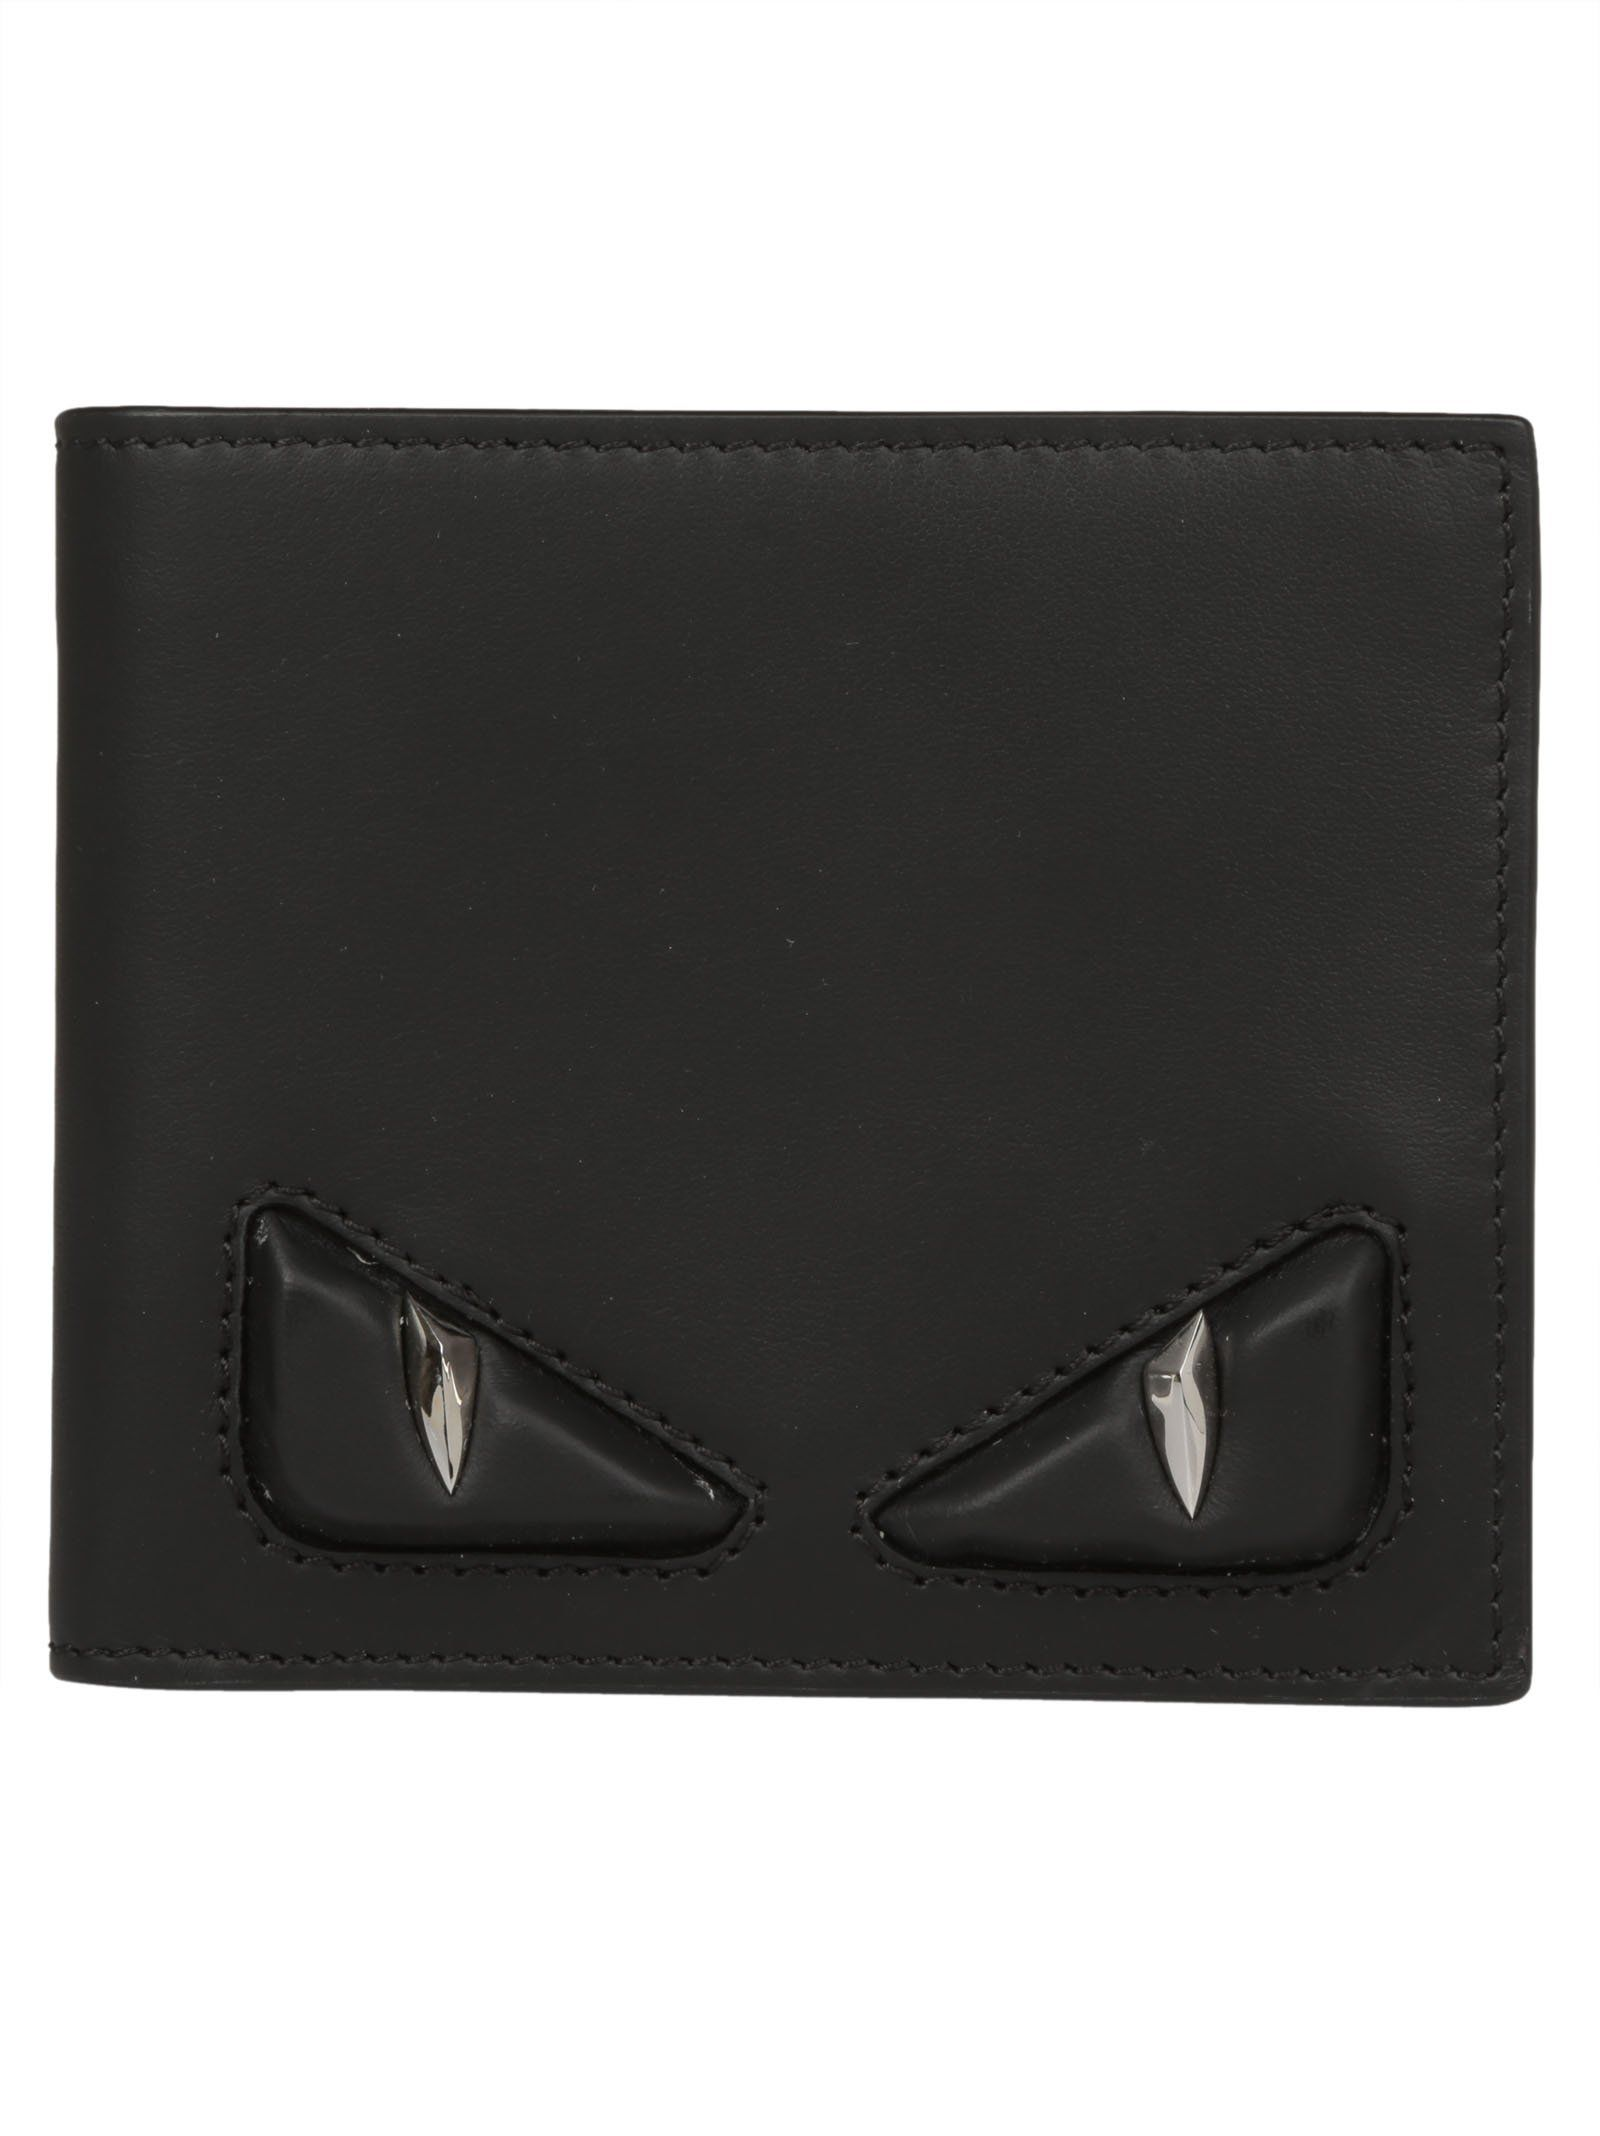 e80b591c6c FENDI FENDI BAG BUGS BIFOLD WALLET. #fendi | Fendi | Fendi bag bugs ...